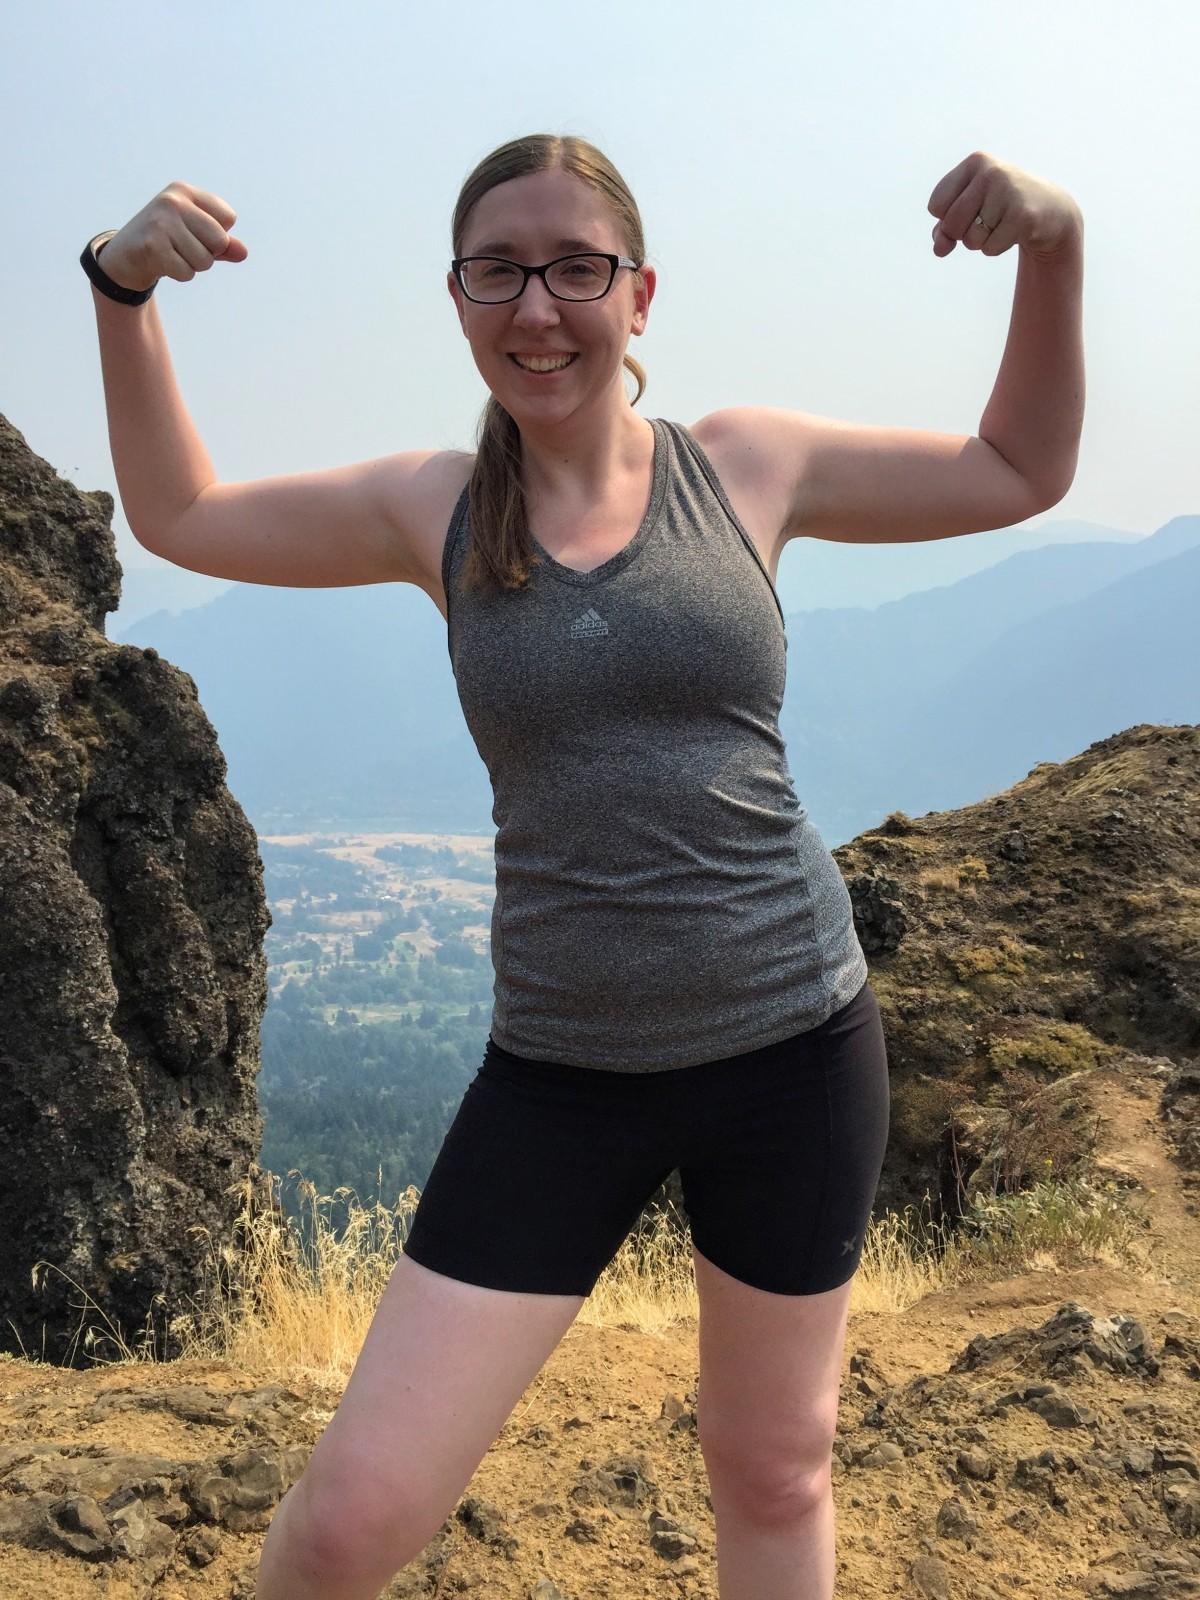 Health and Wellness Baseline – CreativityChallenge